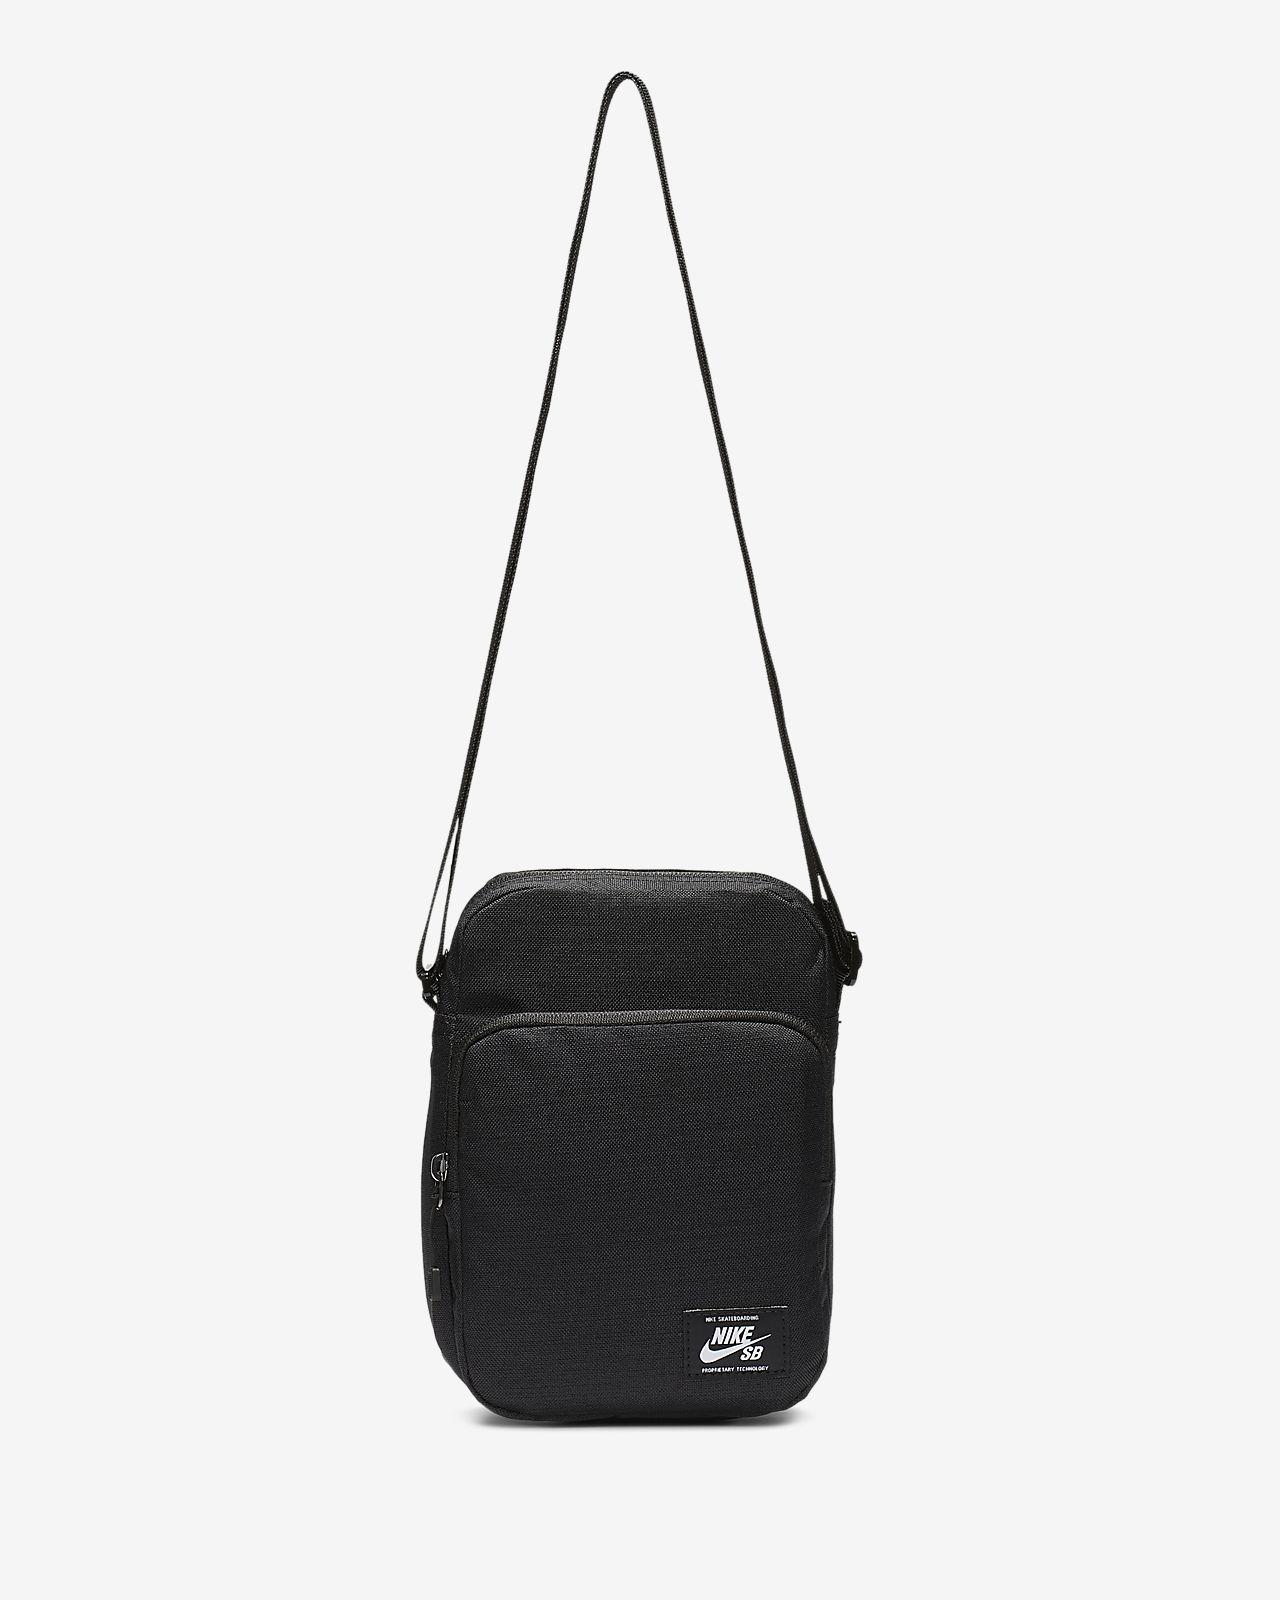 867ba4e3939 Nike SB Heritage Small Items Bag. Nike.com